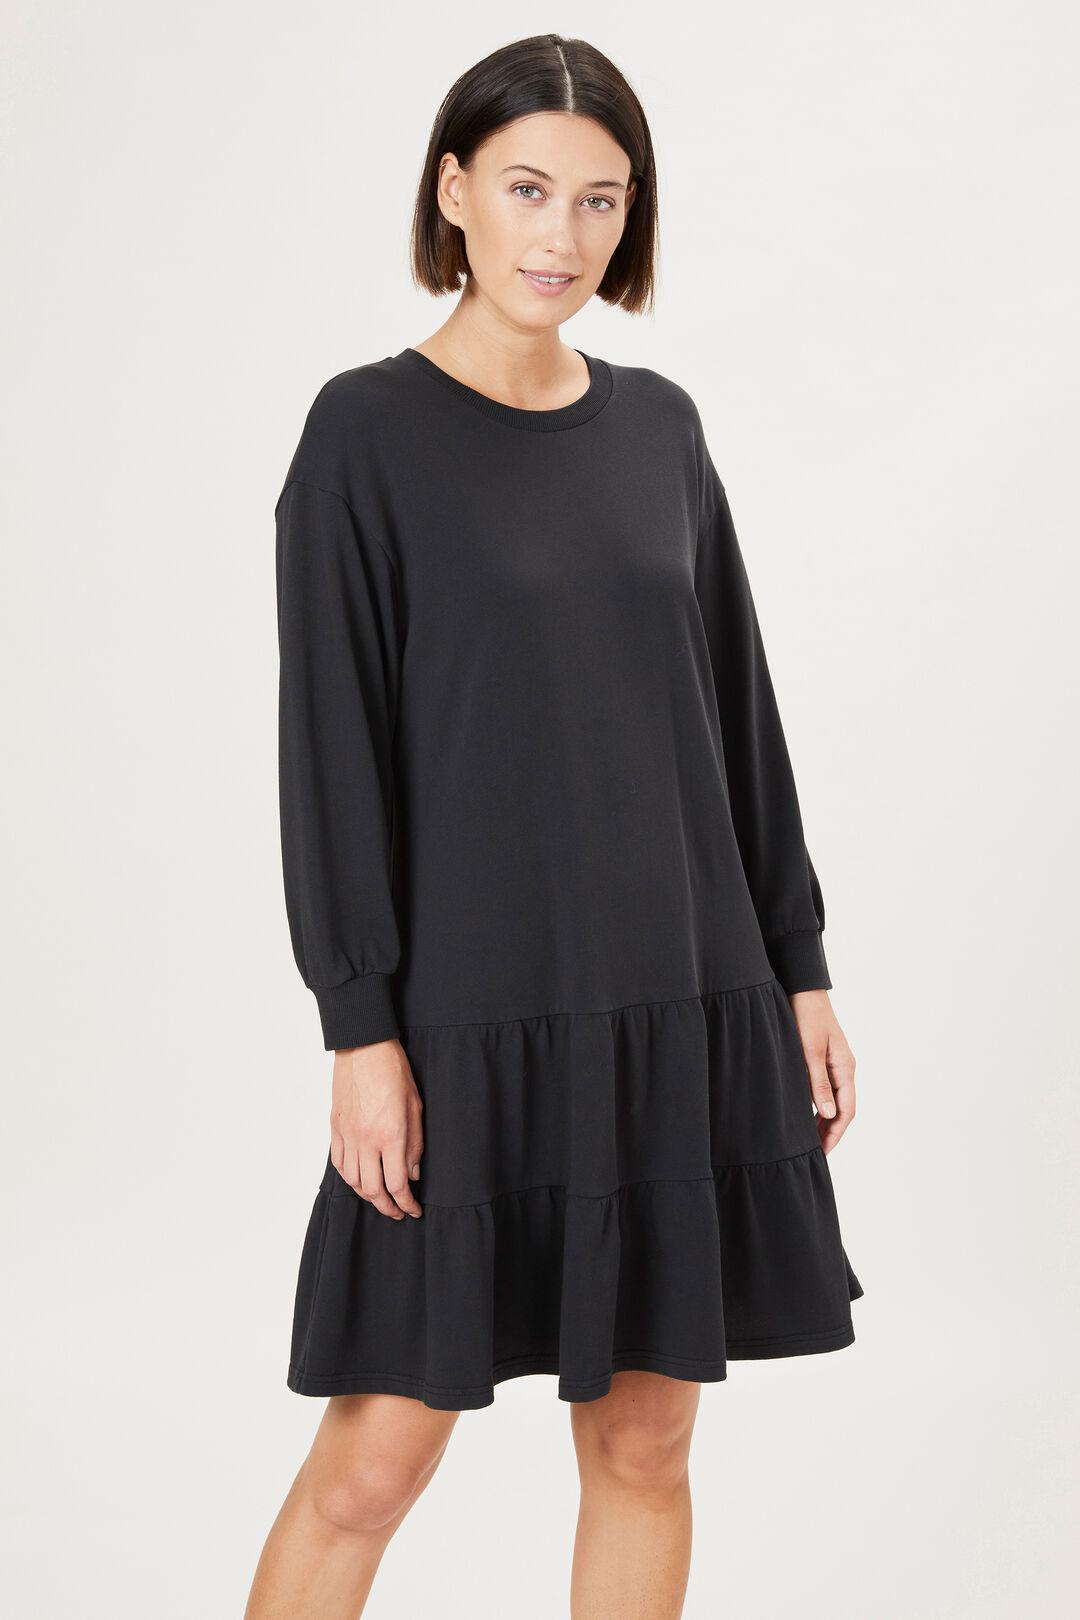 ORGANIC COTTON SWEAT DRESS  BLACK  hi-res